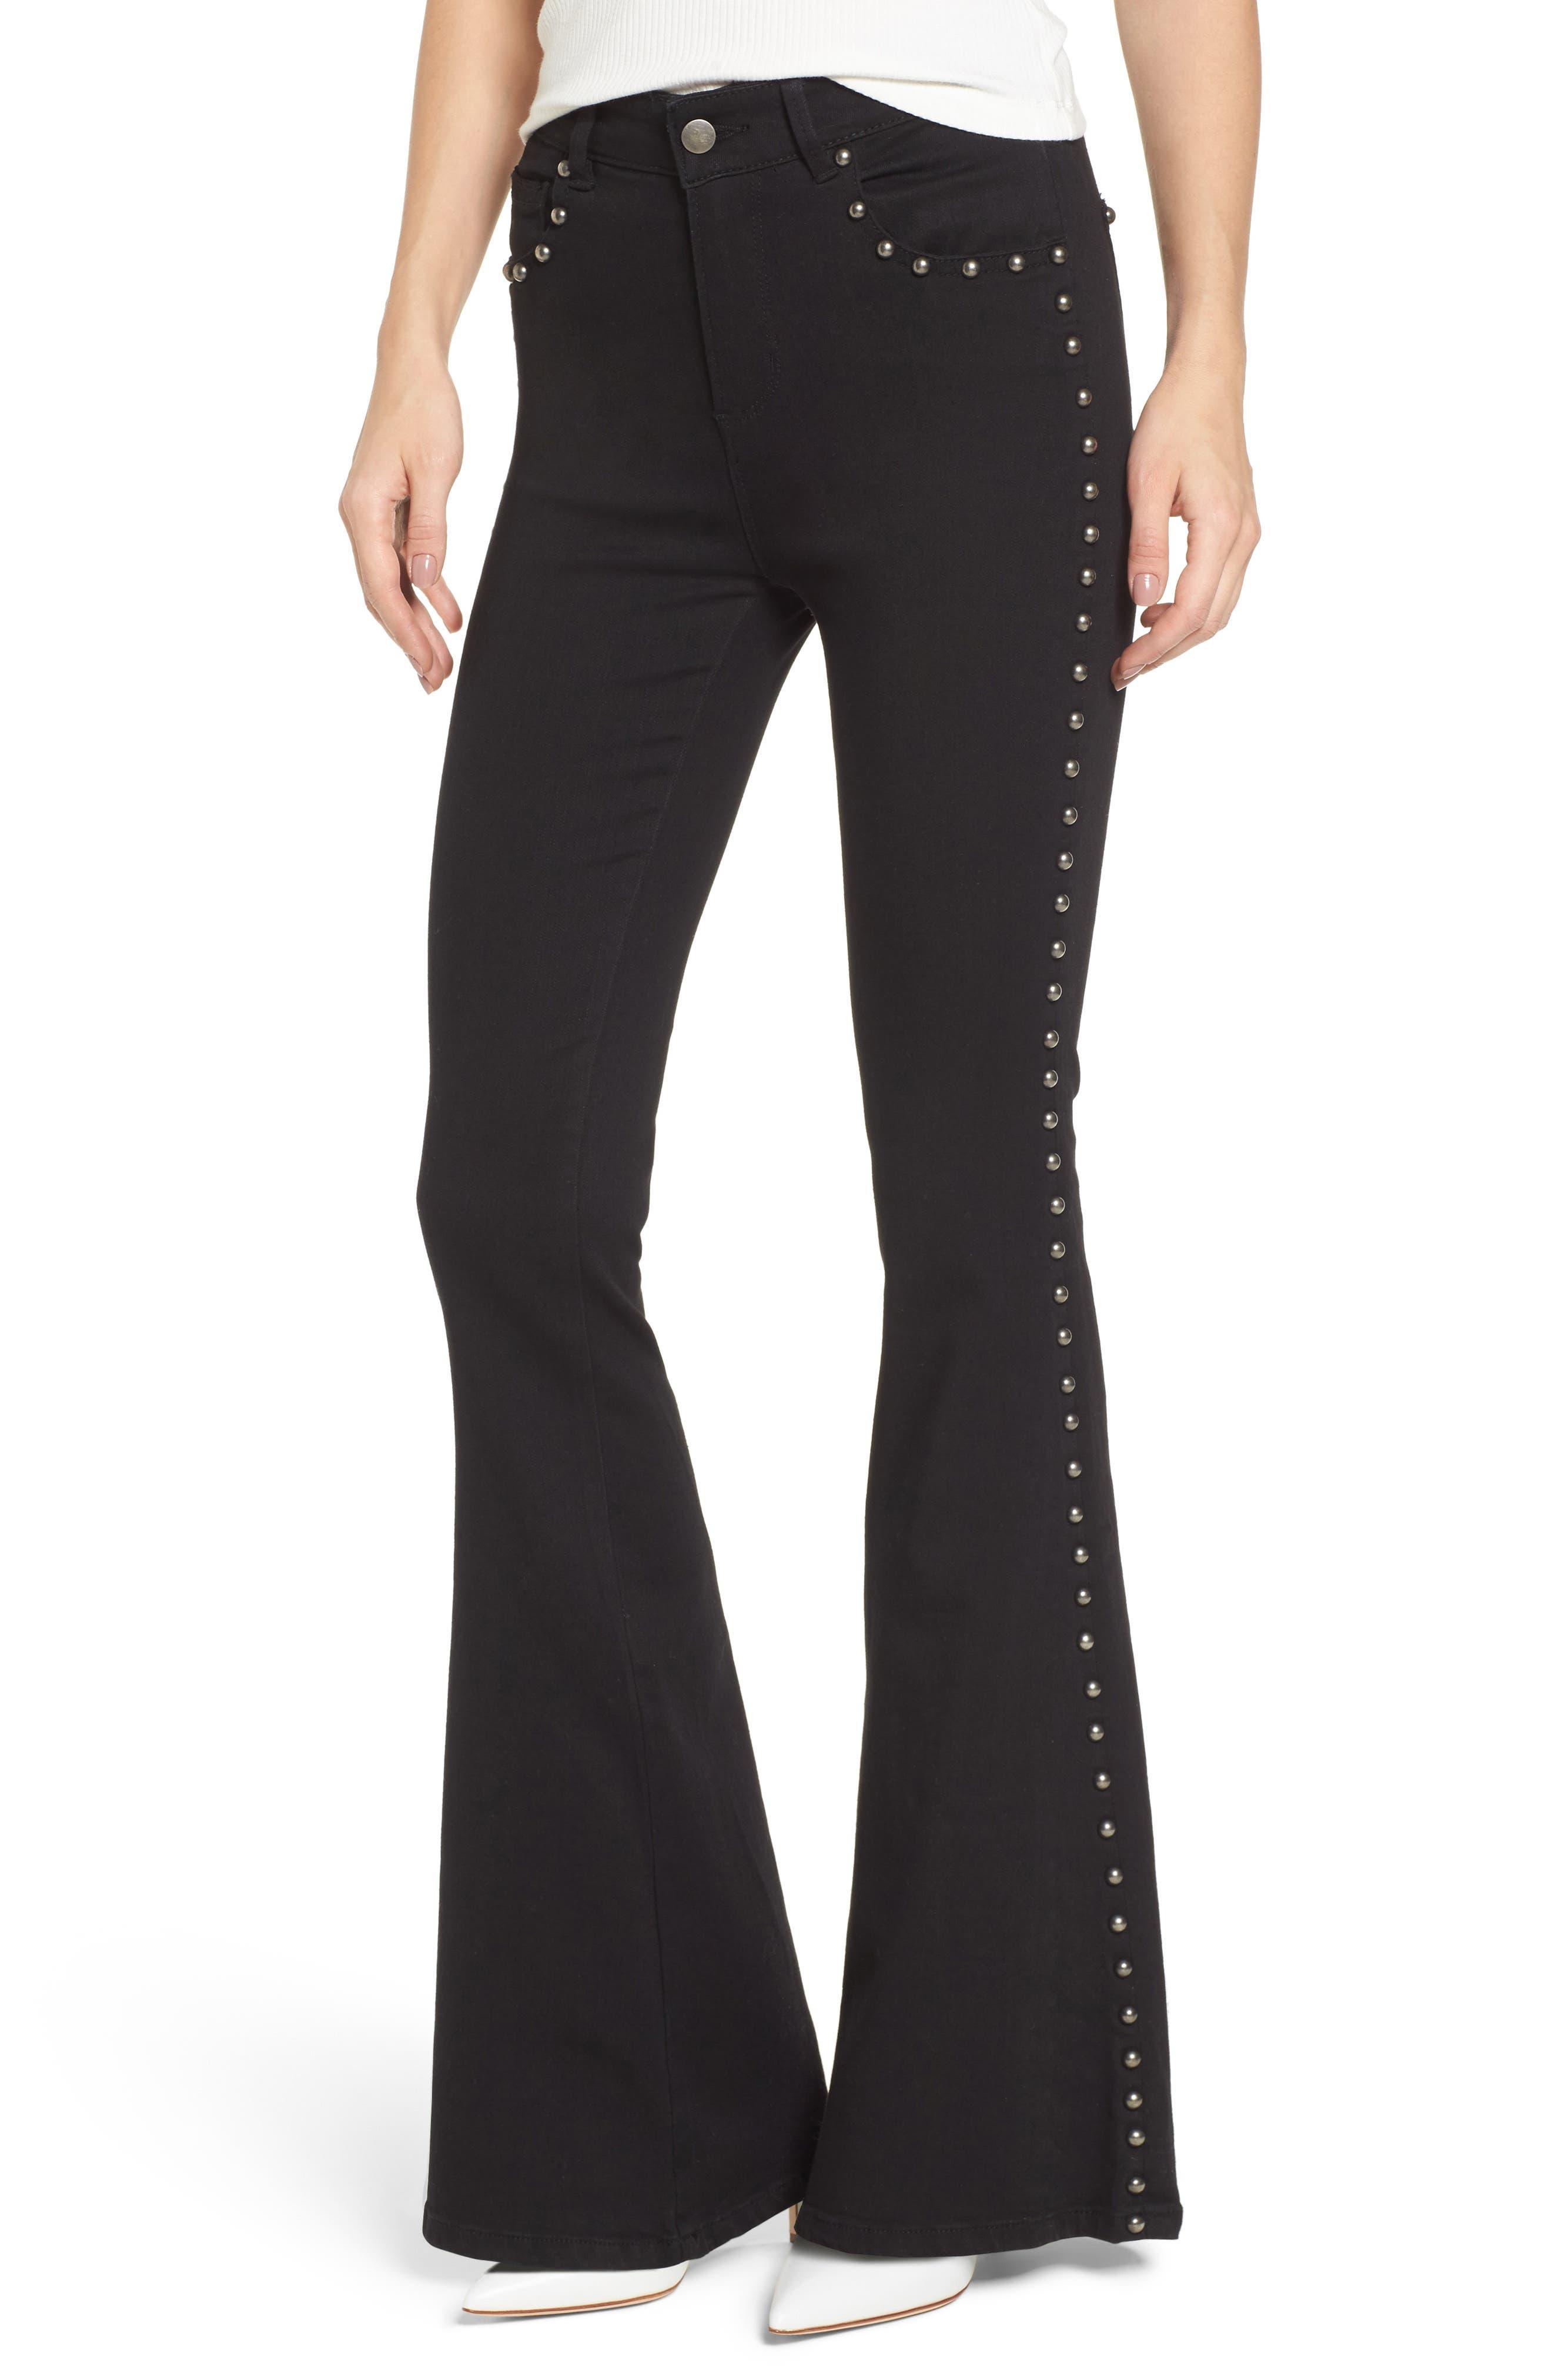 AFRM Stud Flare Jeans